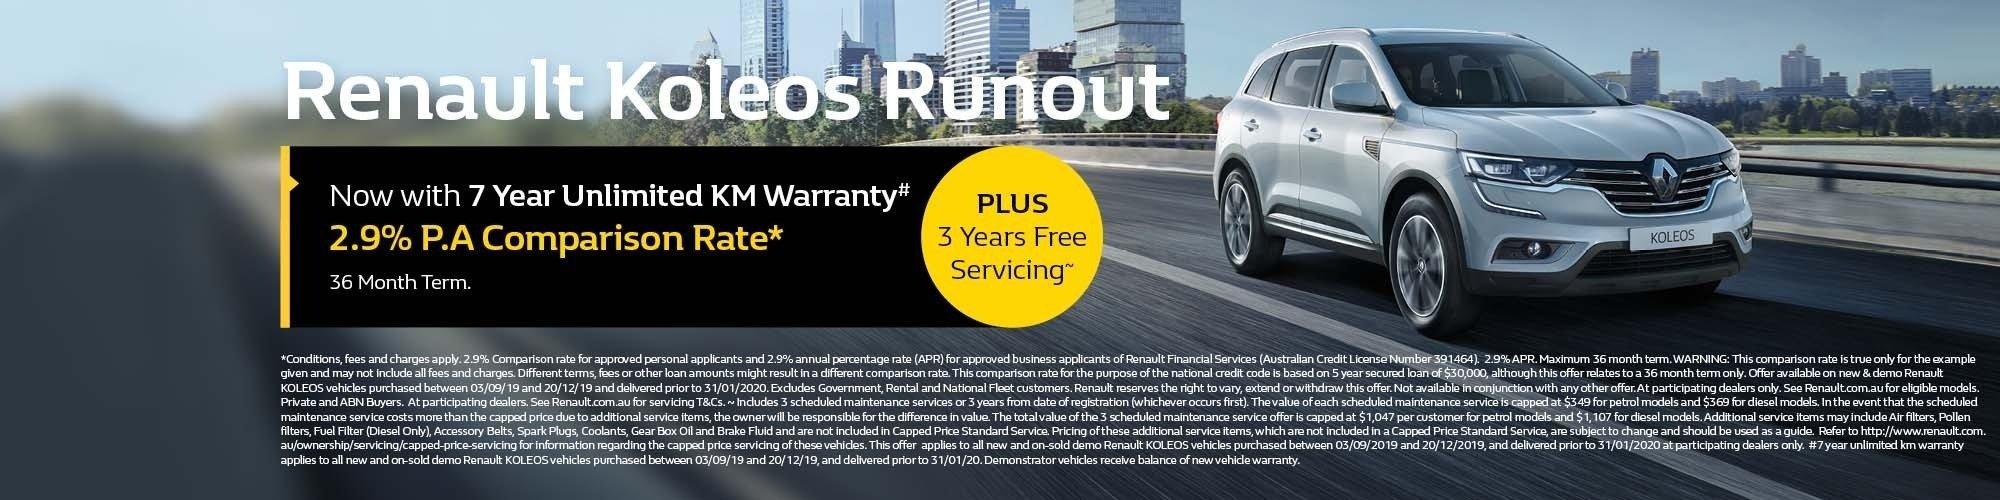 Suttons City Renault Koleos Runout